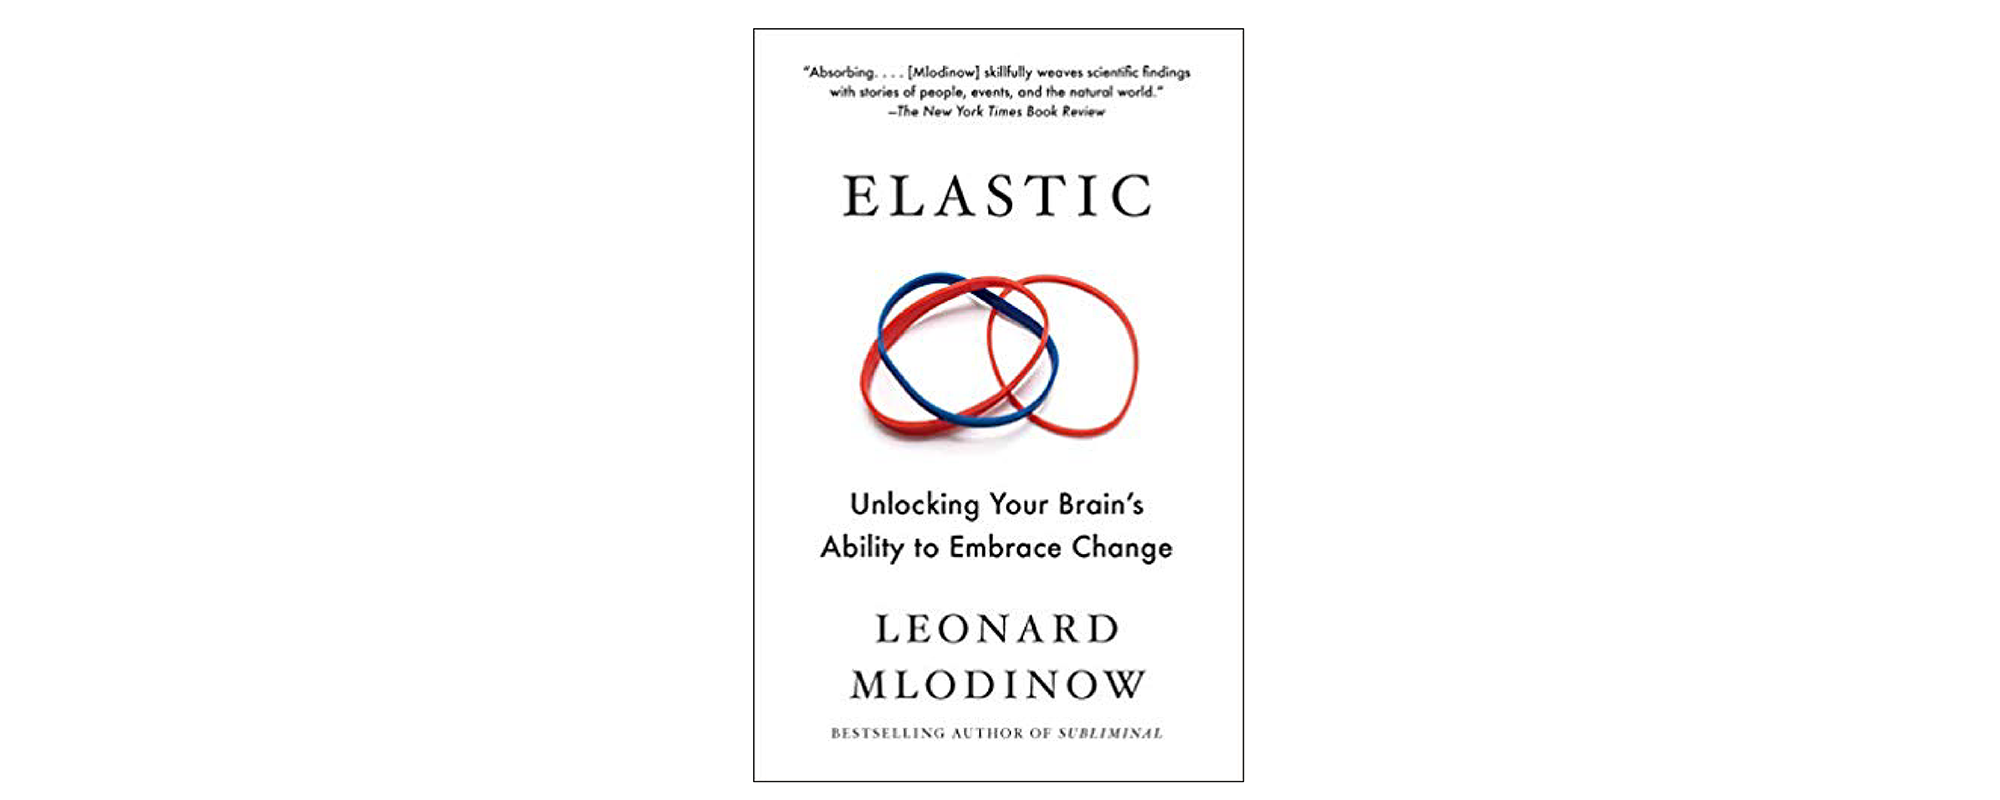 Elastic: Unlocking Your Brain's Ability to Embrace Change by Leonard Mlodinow